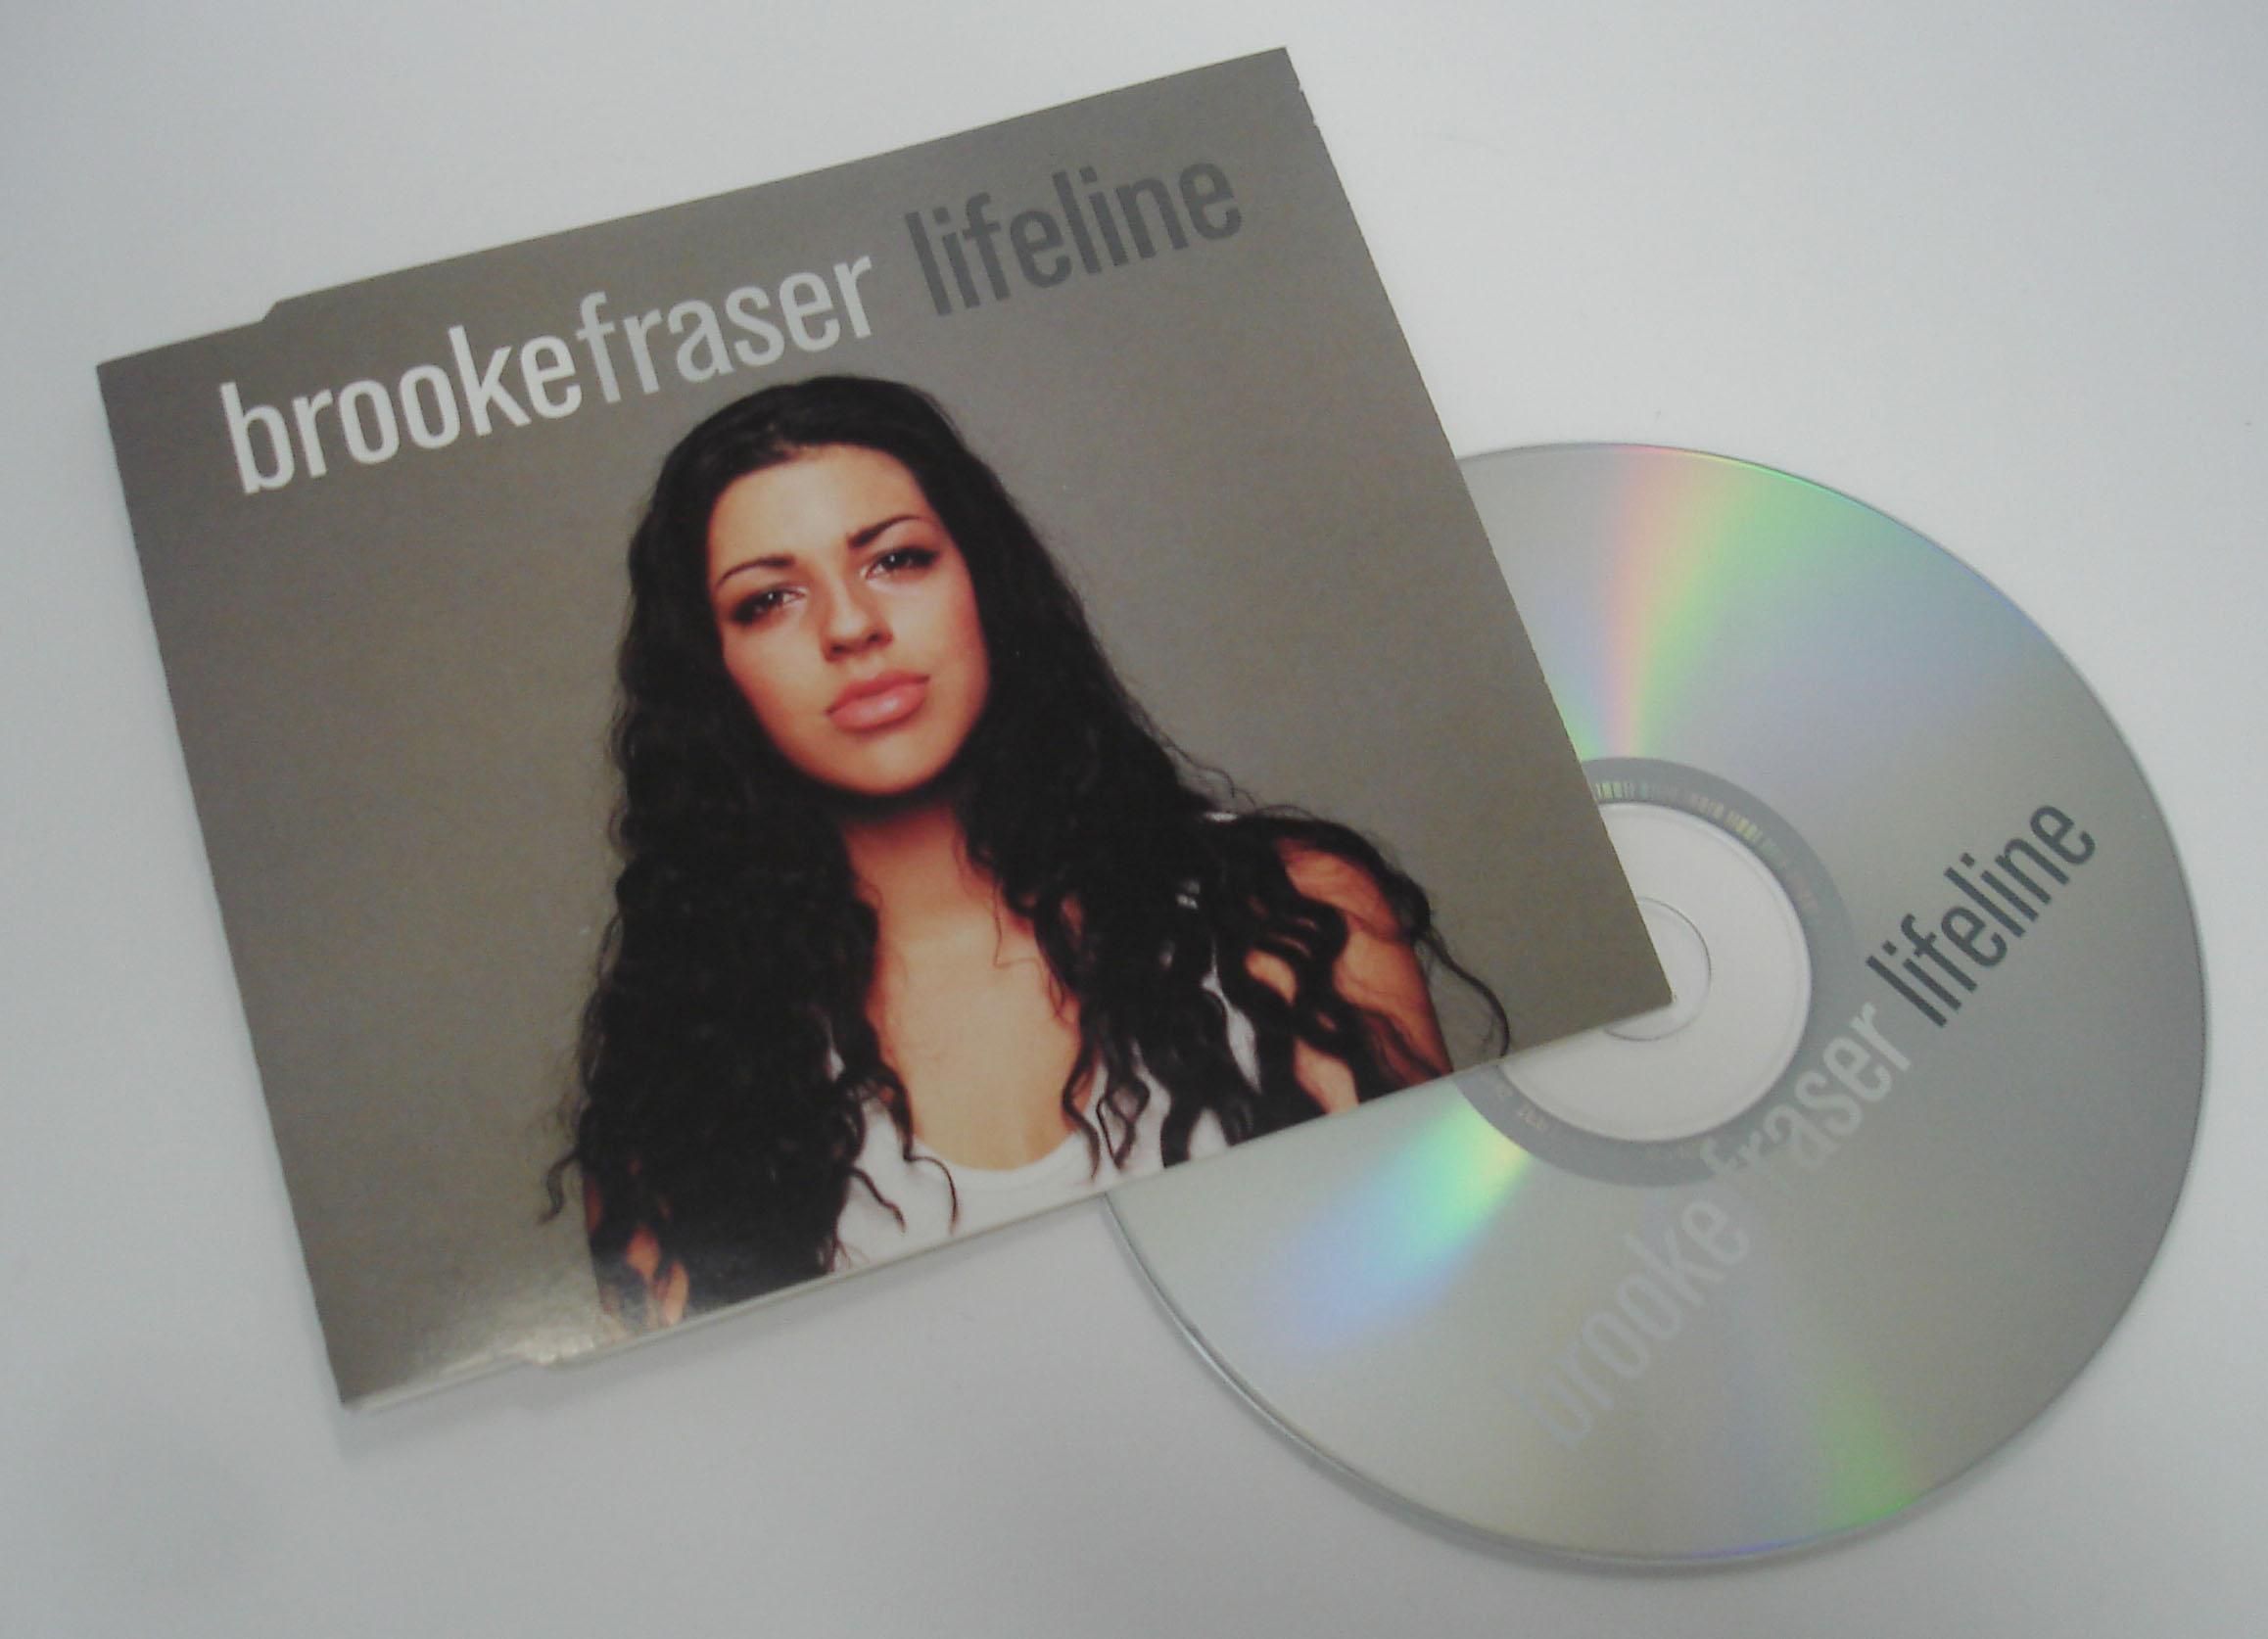 BROOKE FRASER - LIFELINE - SINGLE